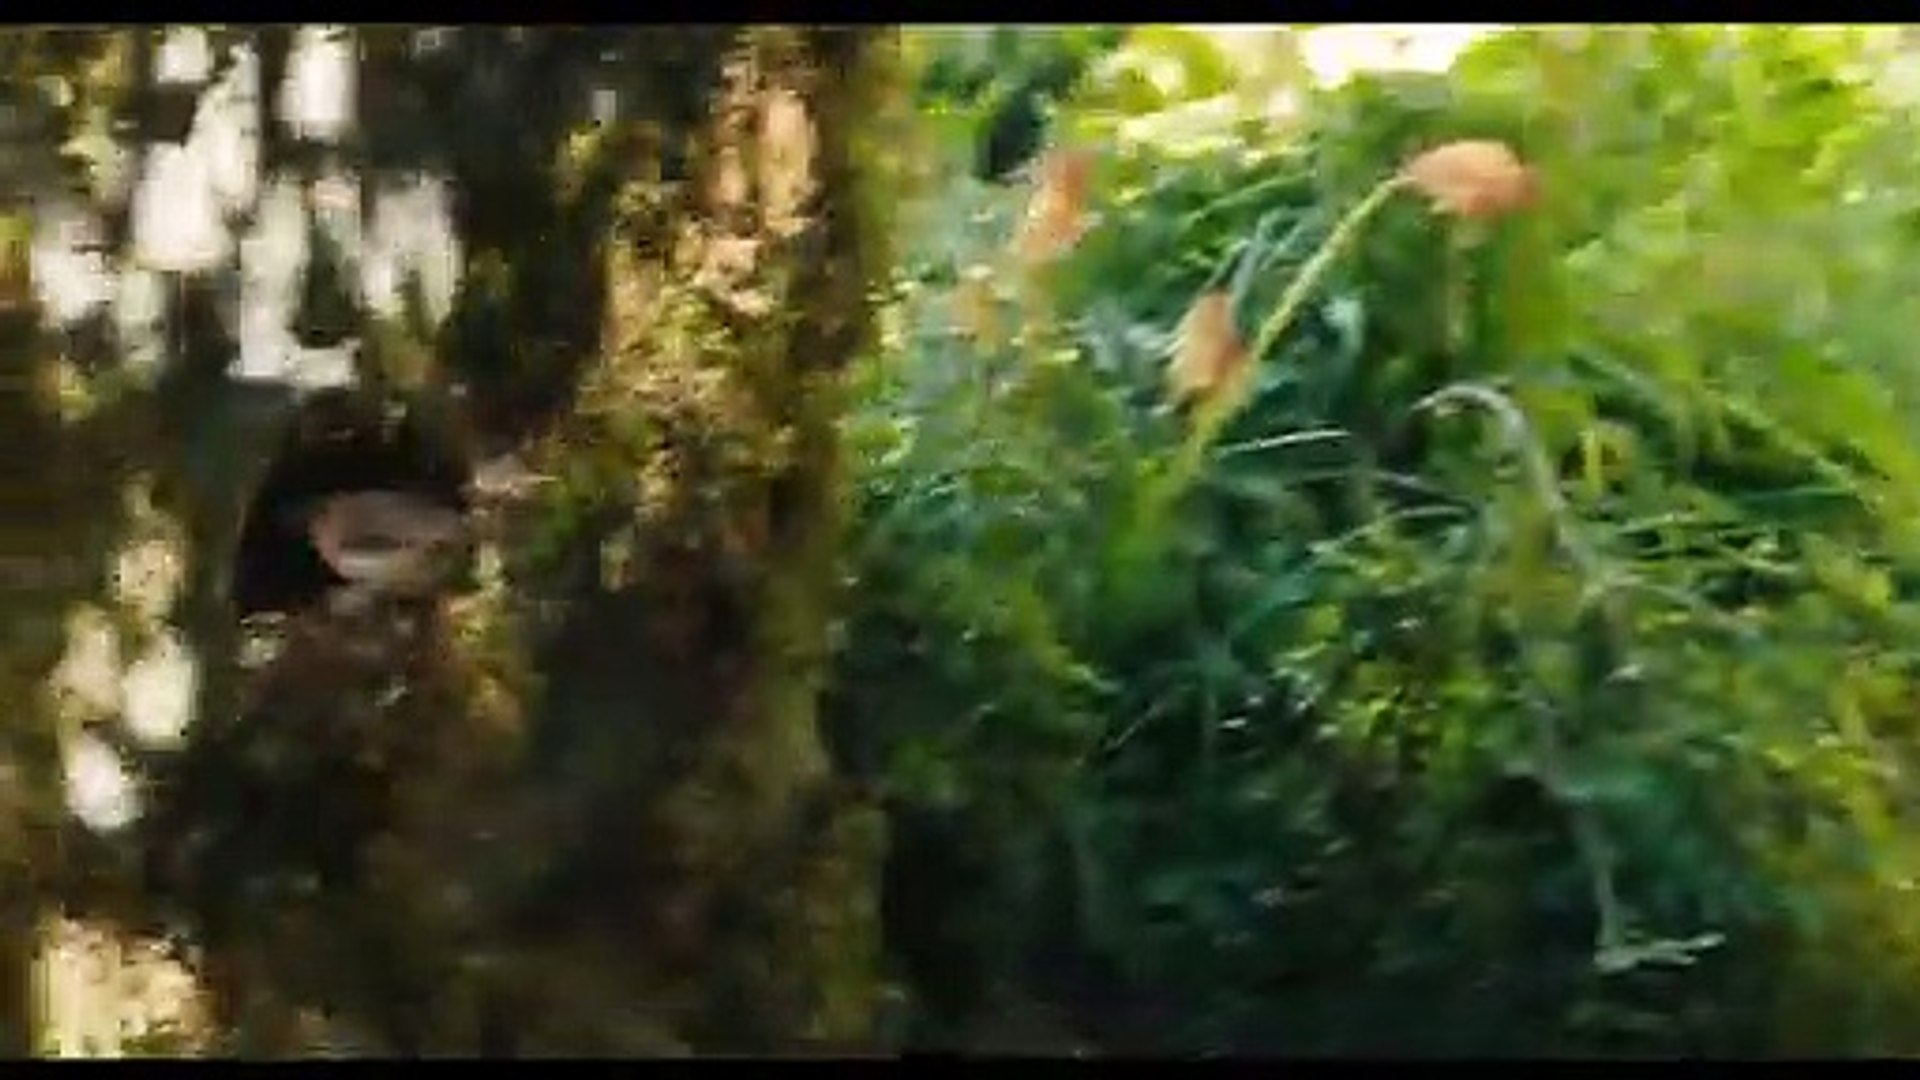 The Secret Garden International Trailer #1 (2020) | Movieclips Trailers